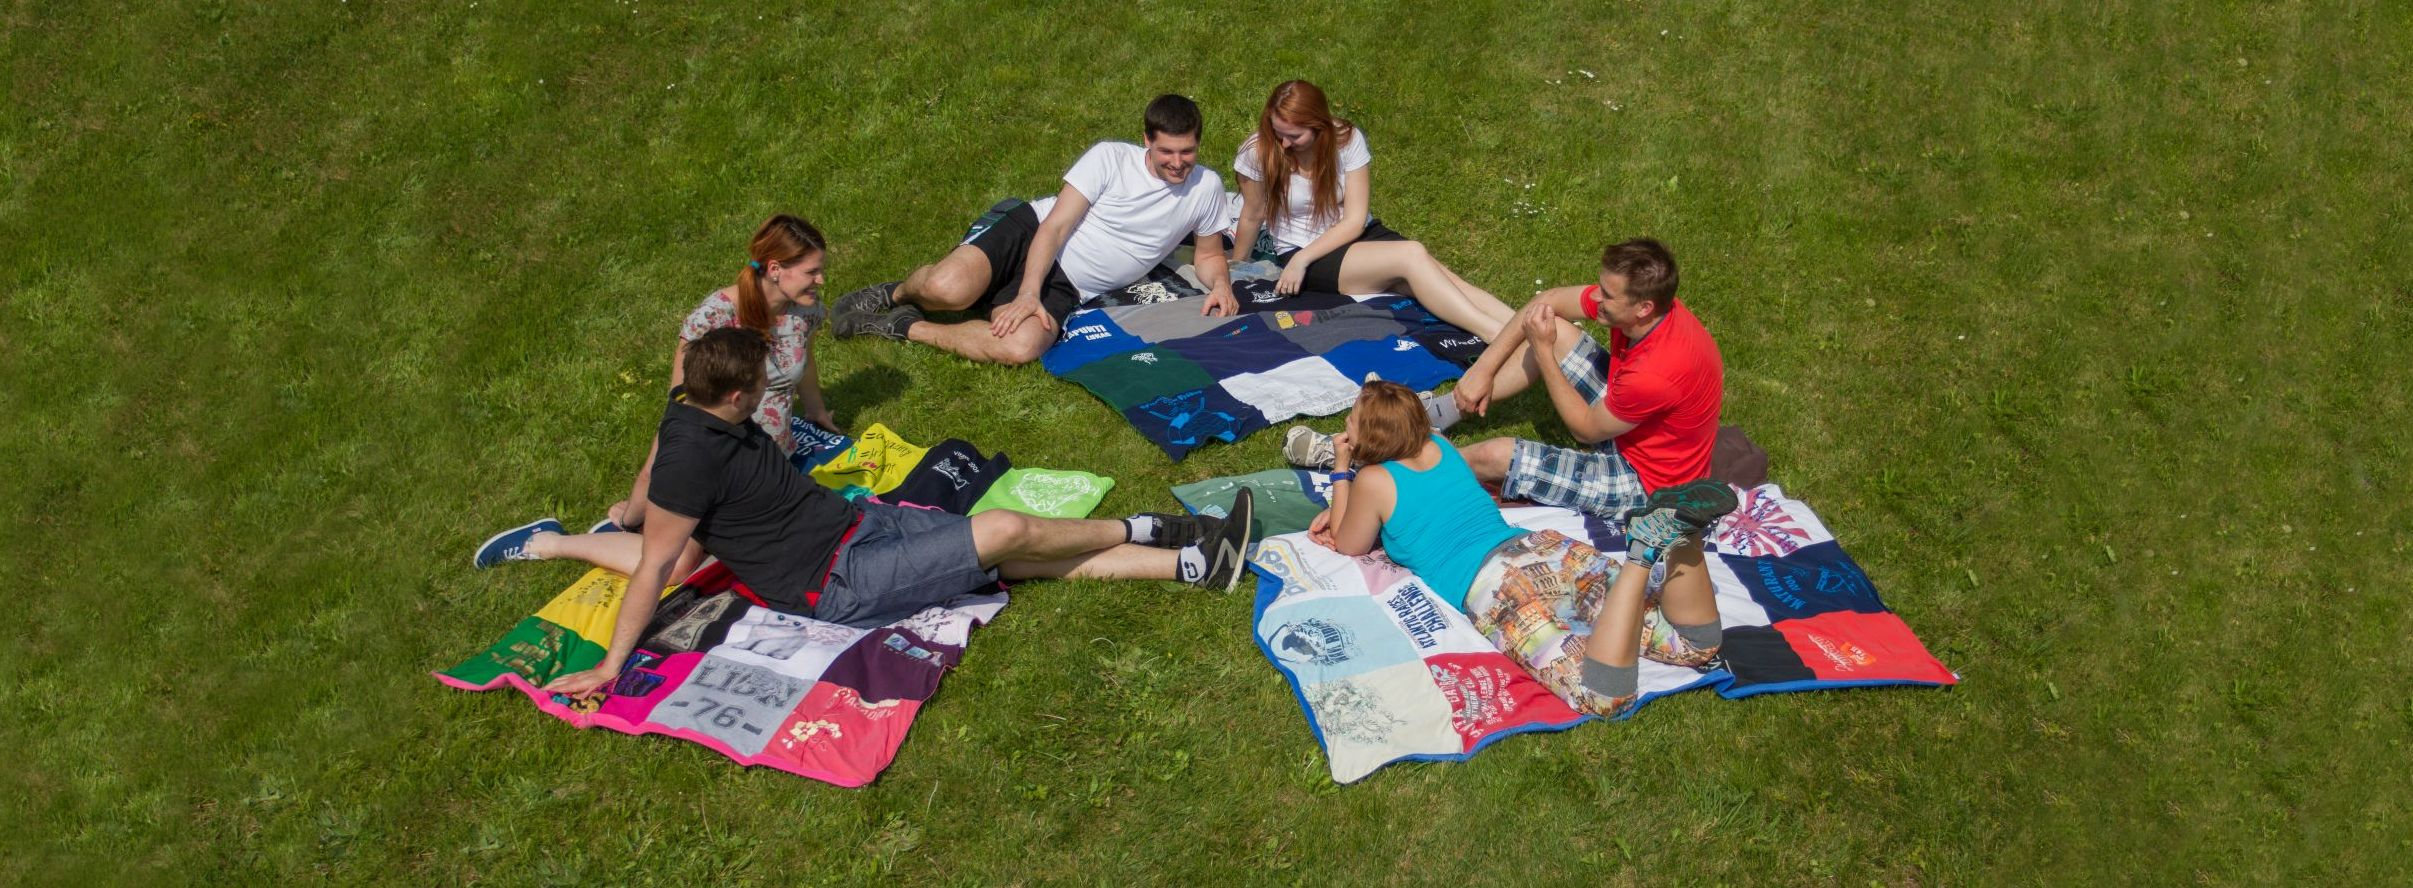 Deky z triček na piknik, nebo na destival